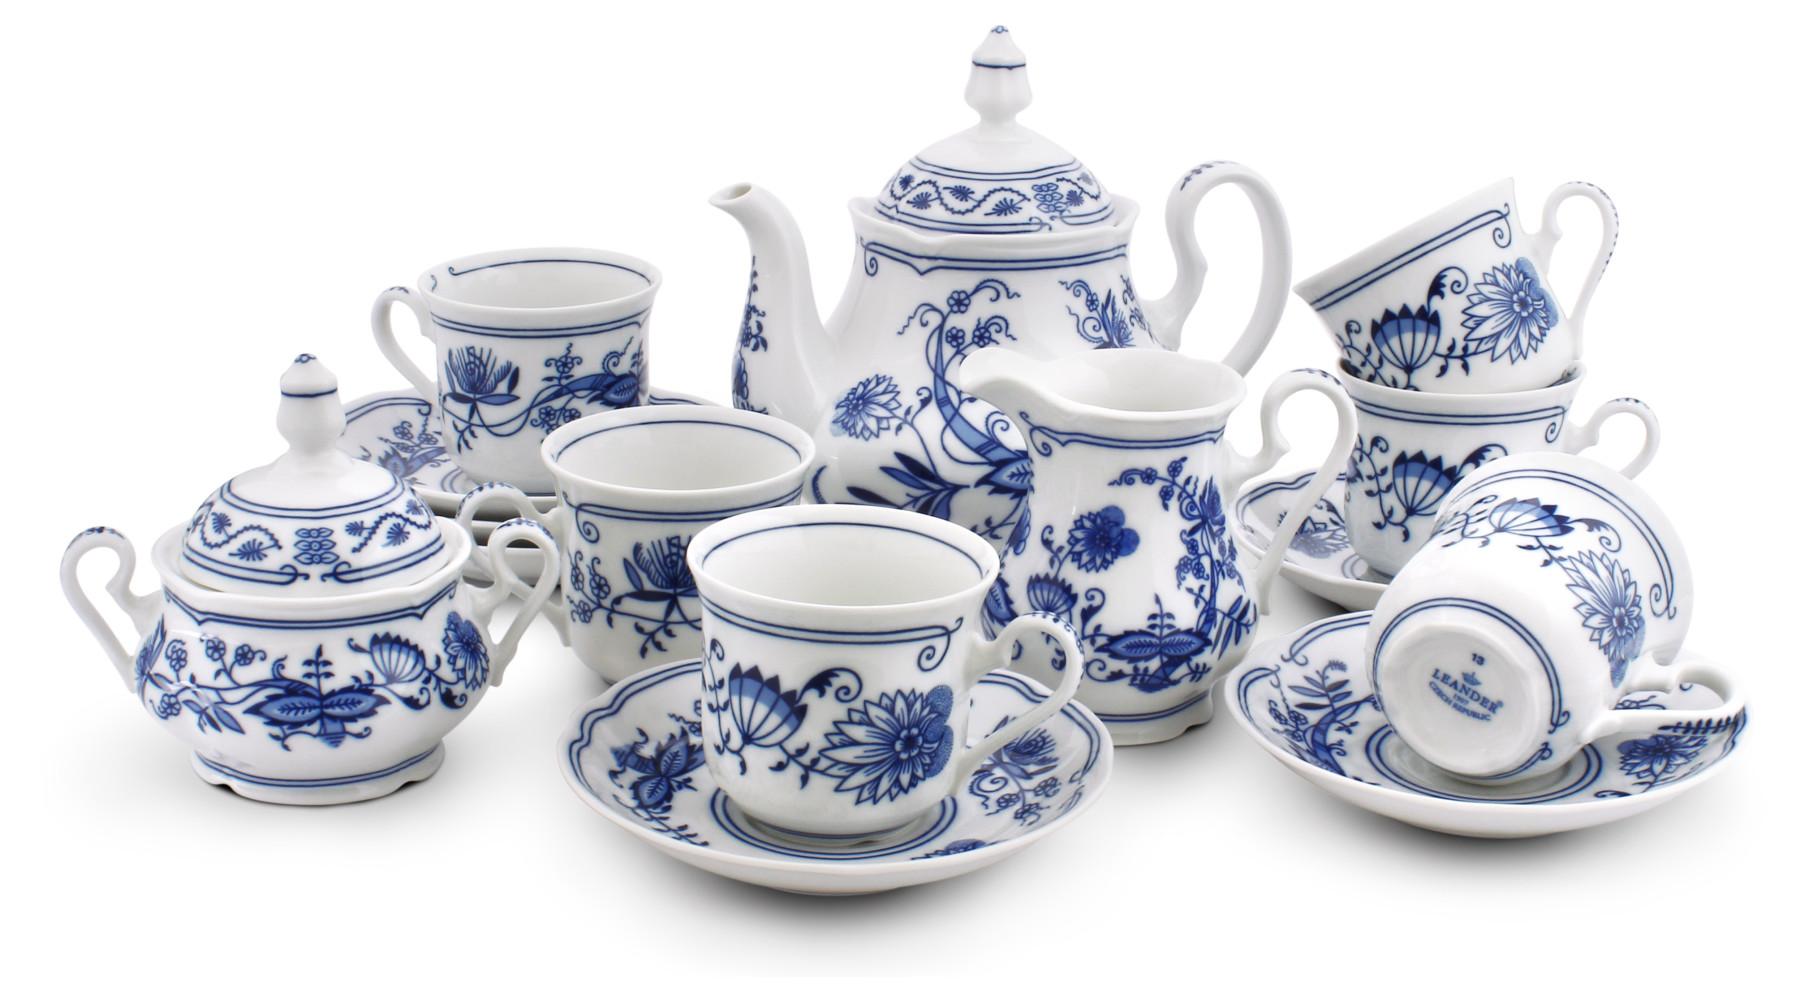 Tea set 15-piece - Blue onion china